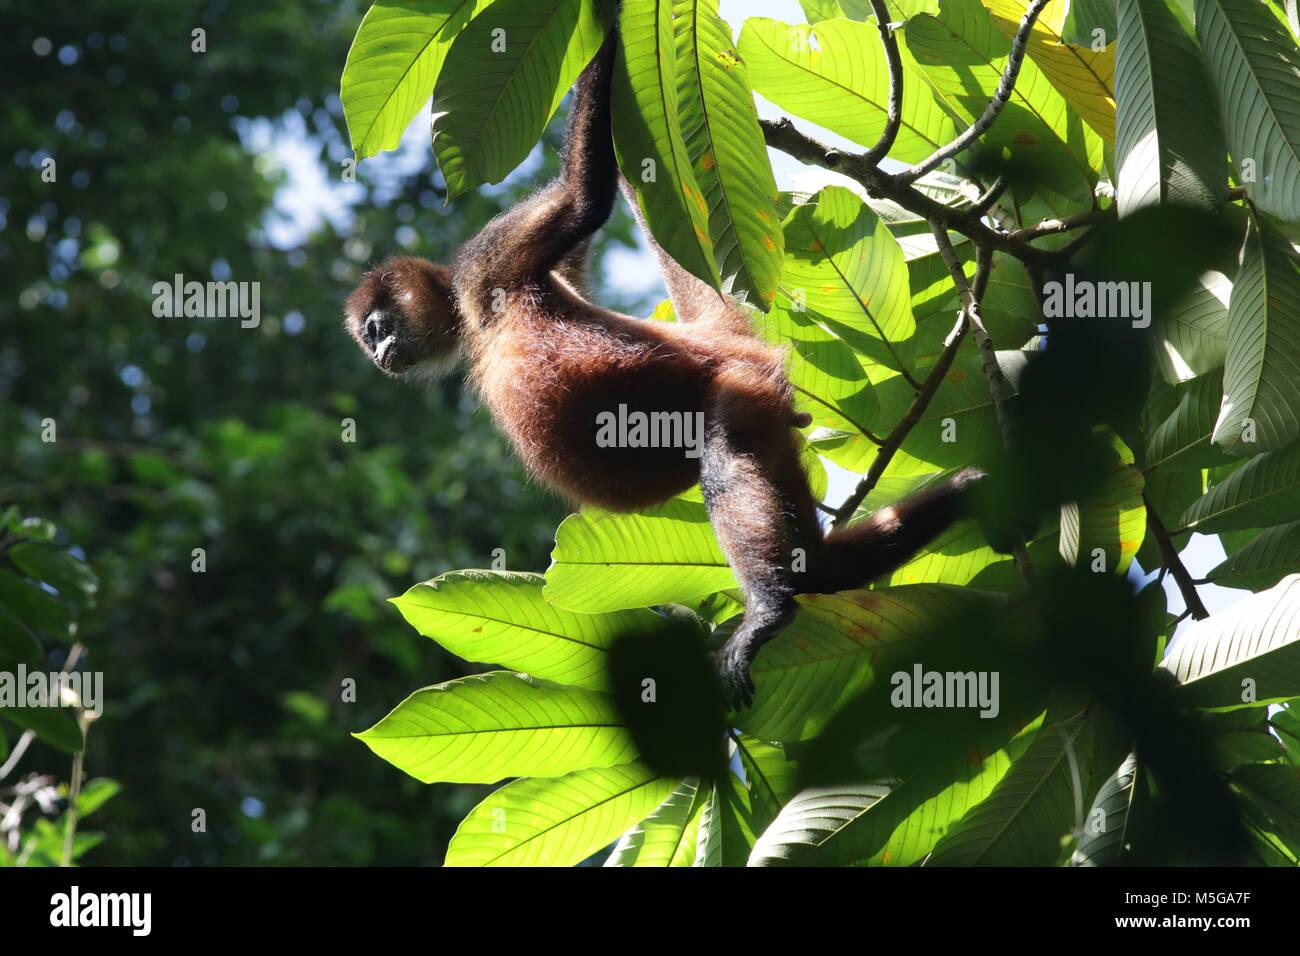 Howler Monkey - Stock Image